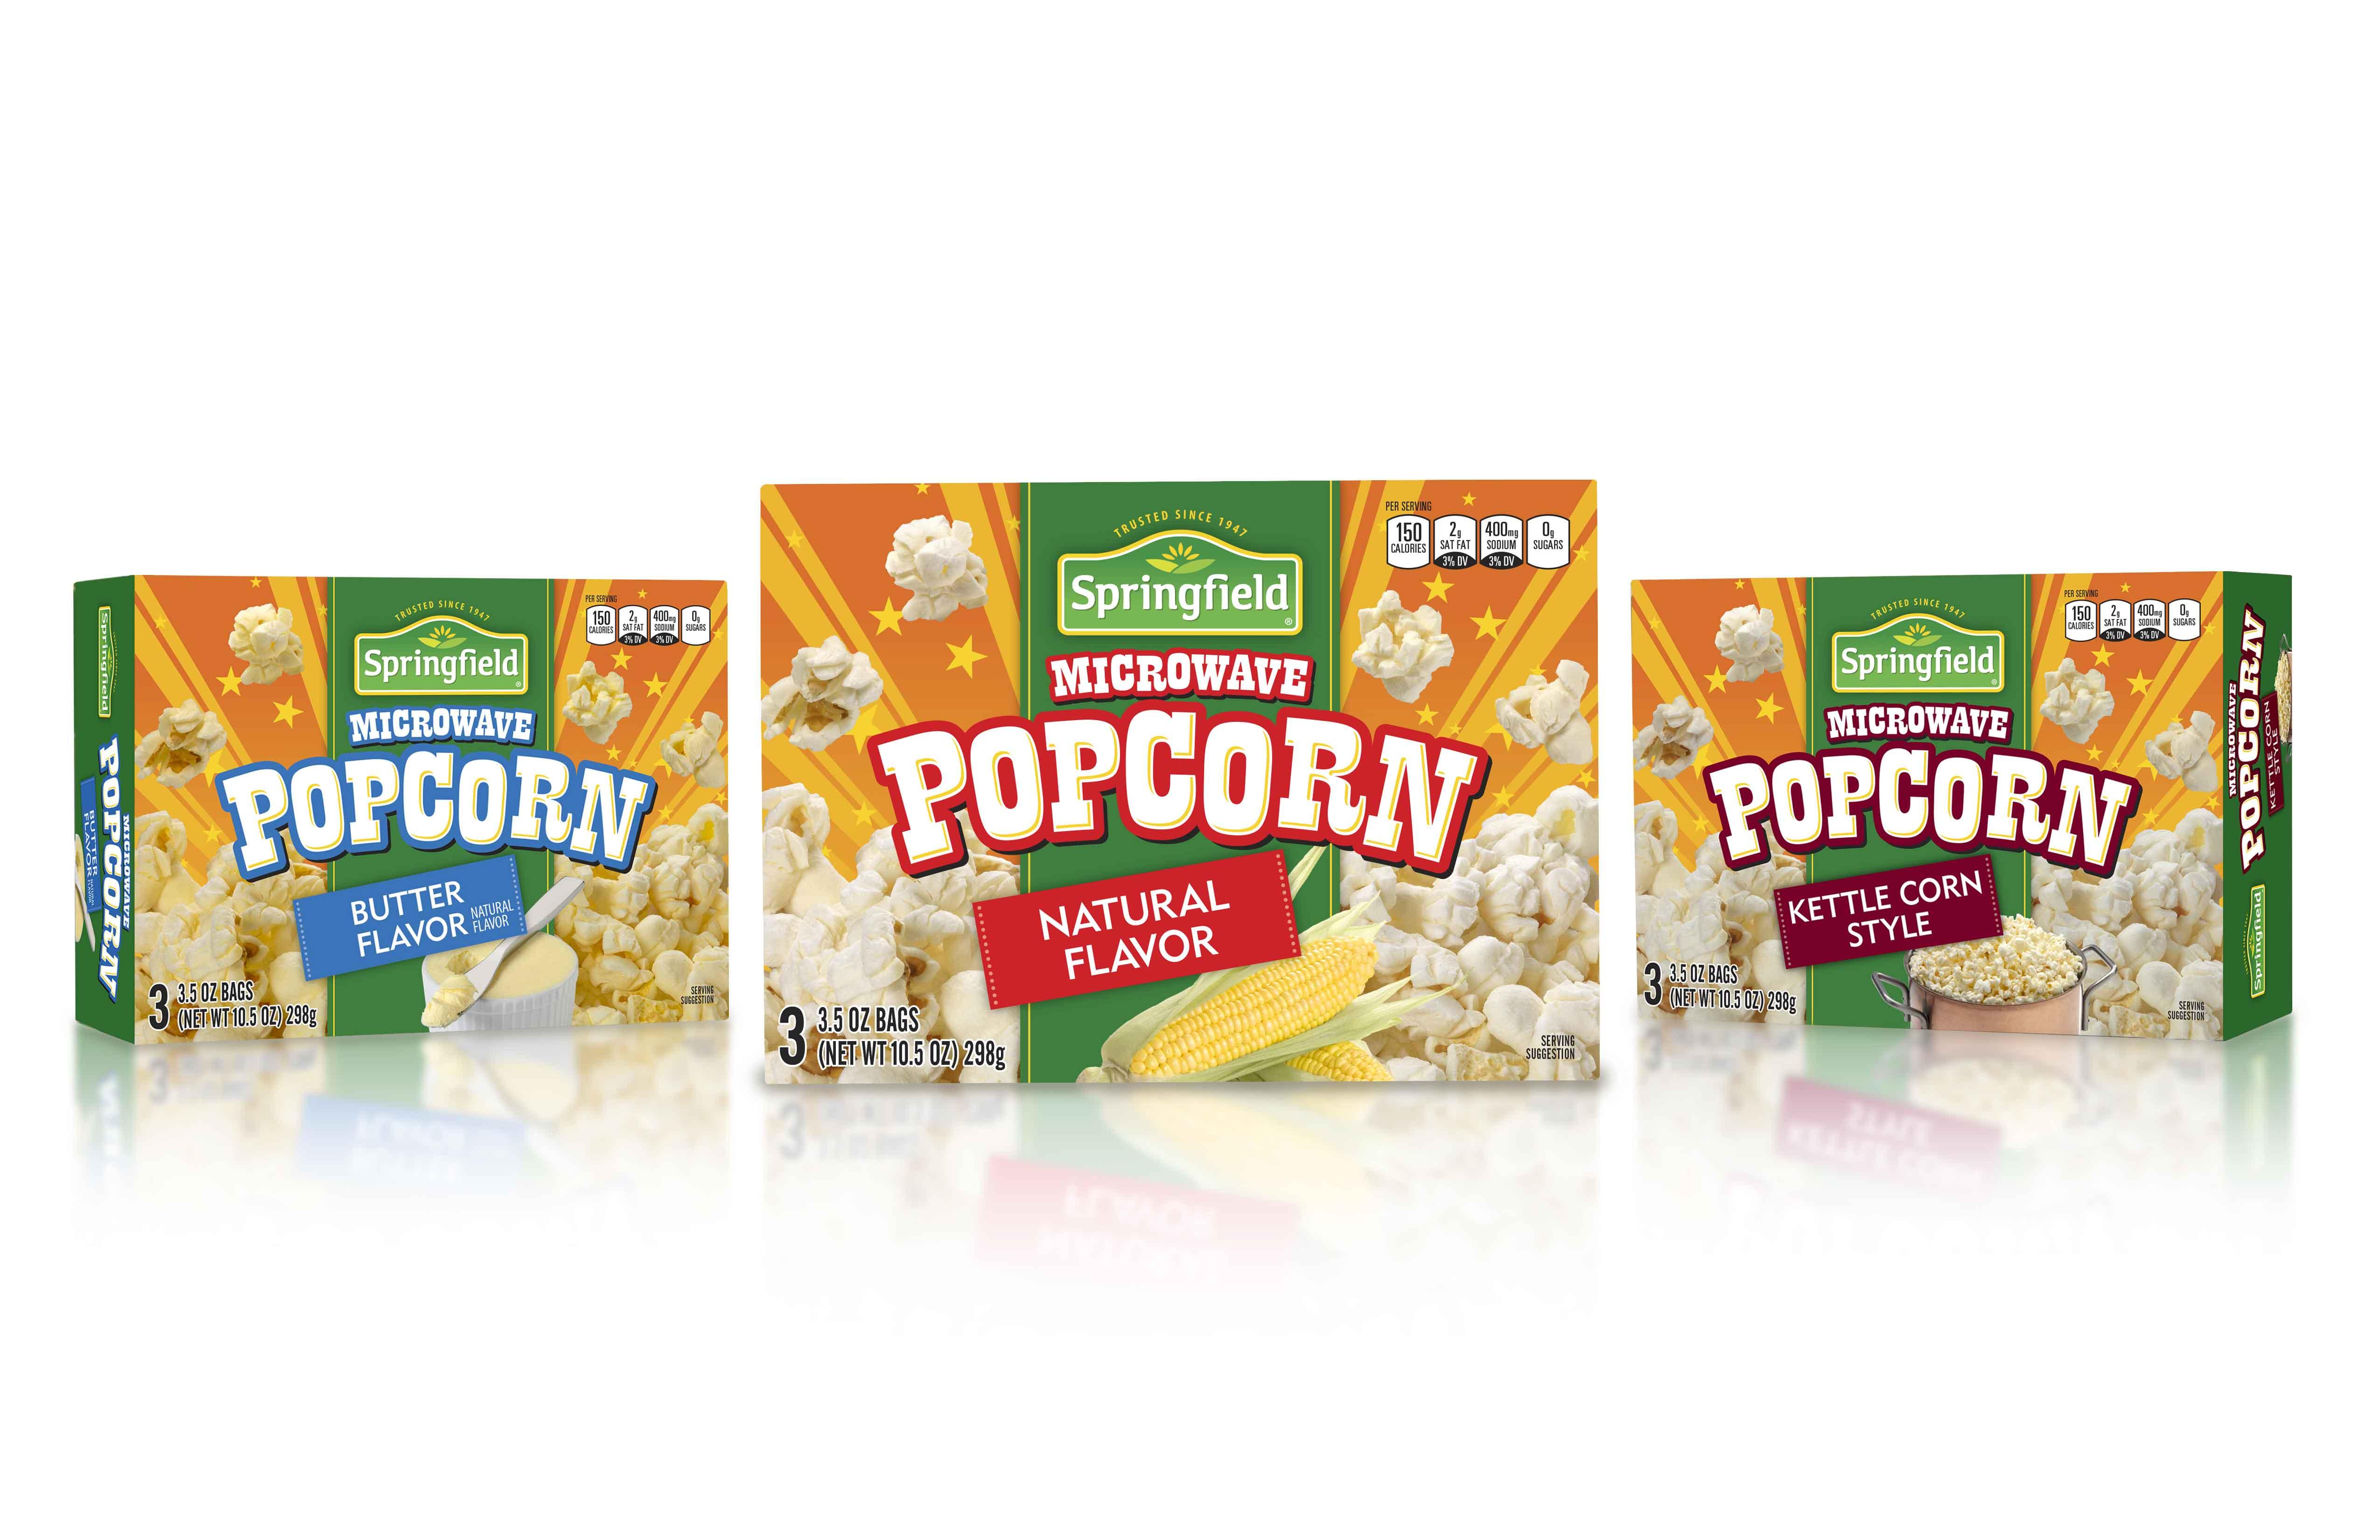 Springfield Popcorn Design